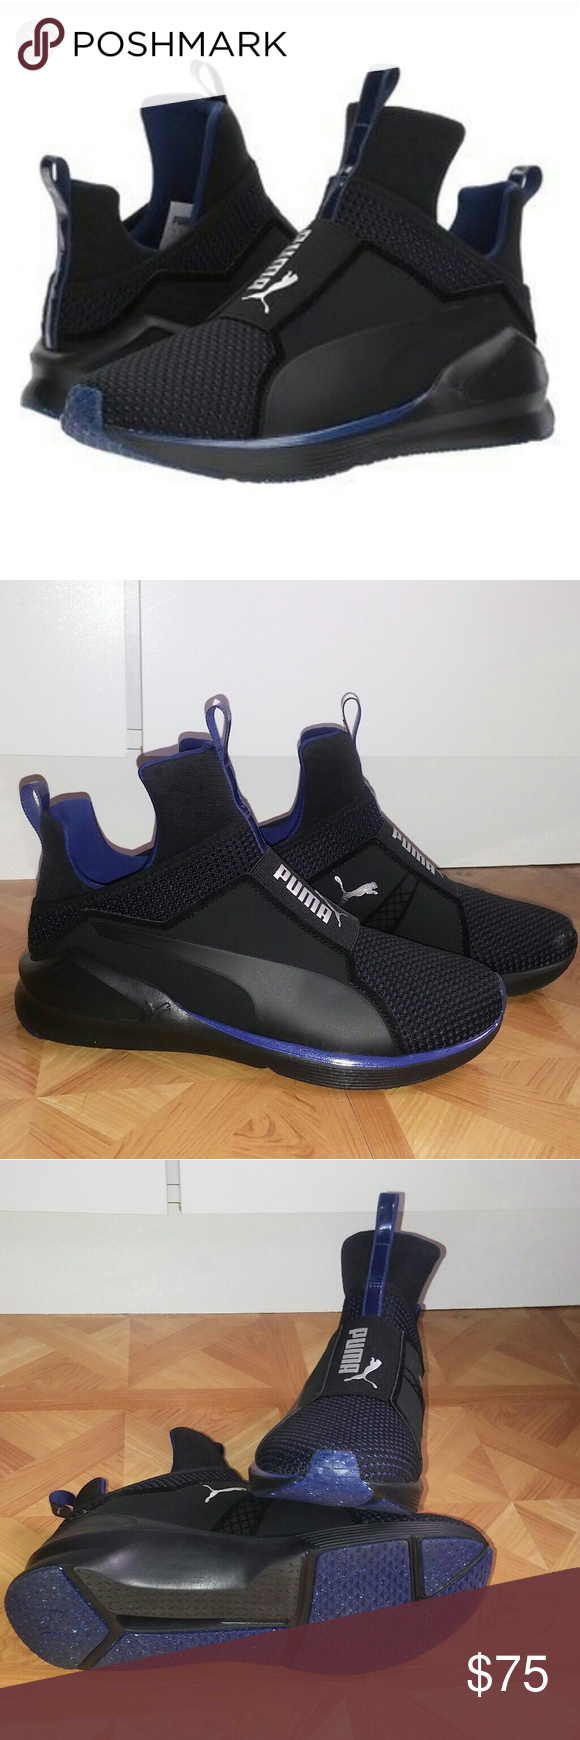 acd330b53d2b PUMA - Fierce Velvet VR (Puma Black Icelandic l 😍 -Breathable mesh upper